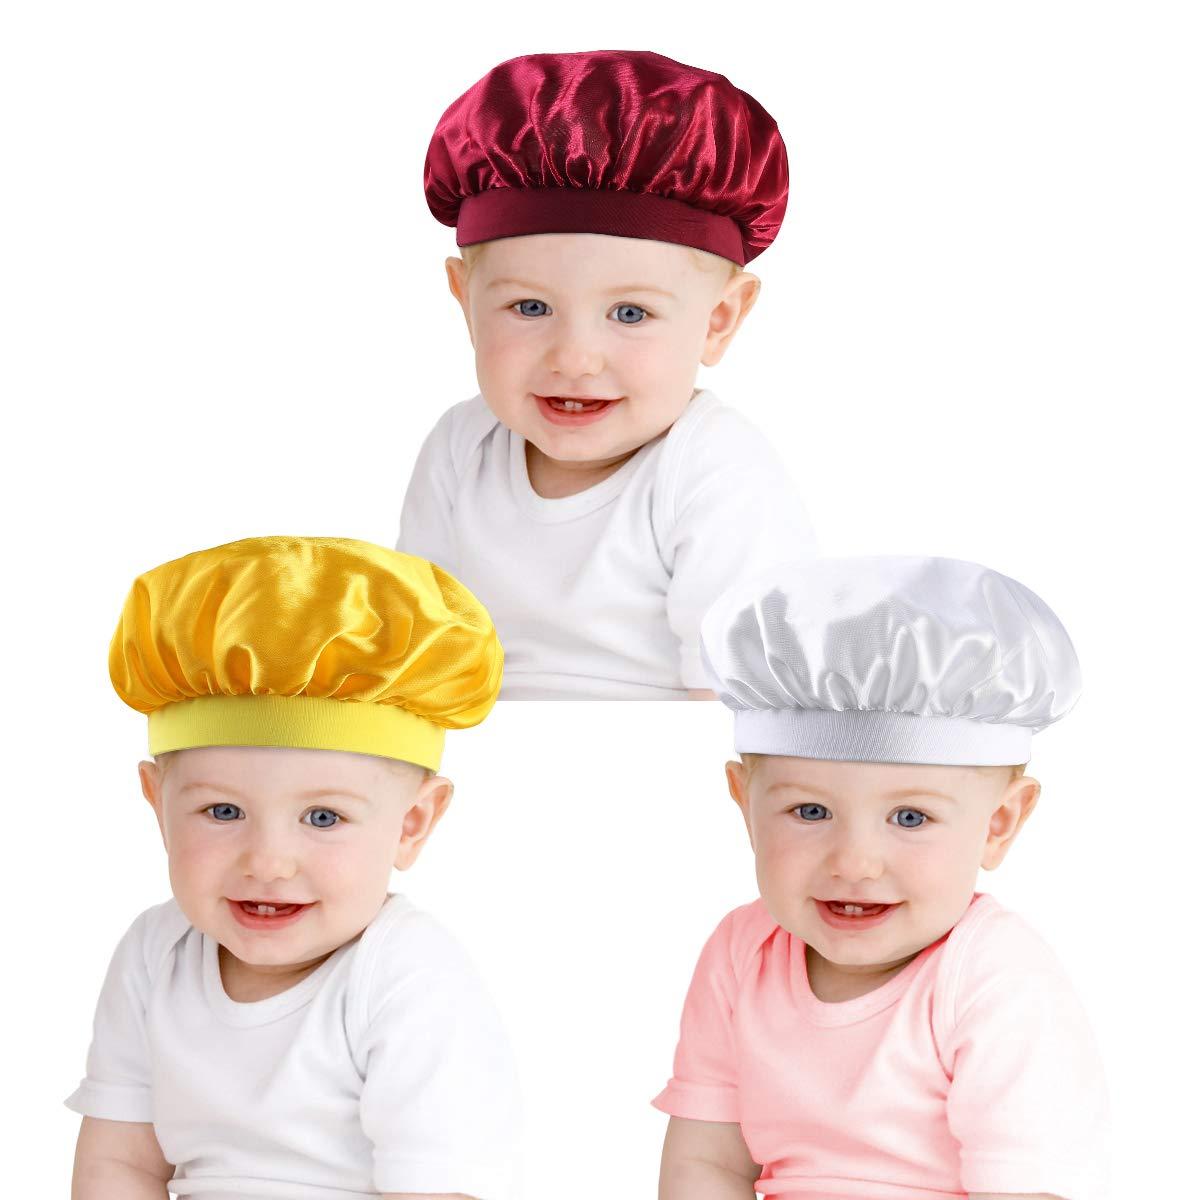 3 Pack Kids Sleep Cap,Children Satin Night Sleep Cap Elastic Wide Band Shower Cap Waterproof Bath Hat for Boys Girls